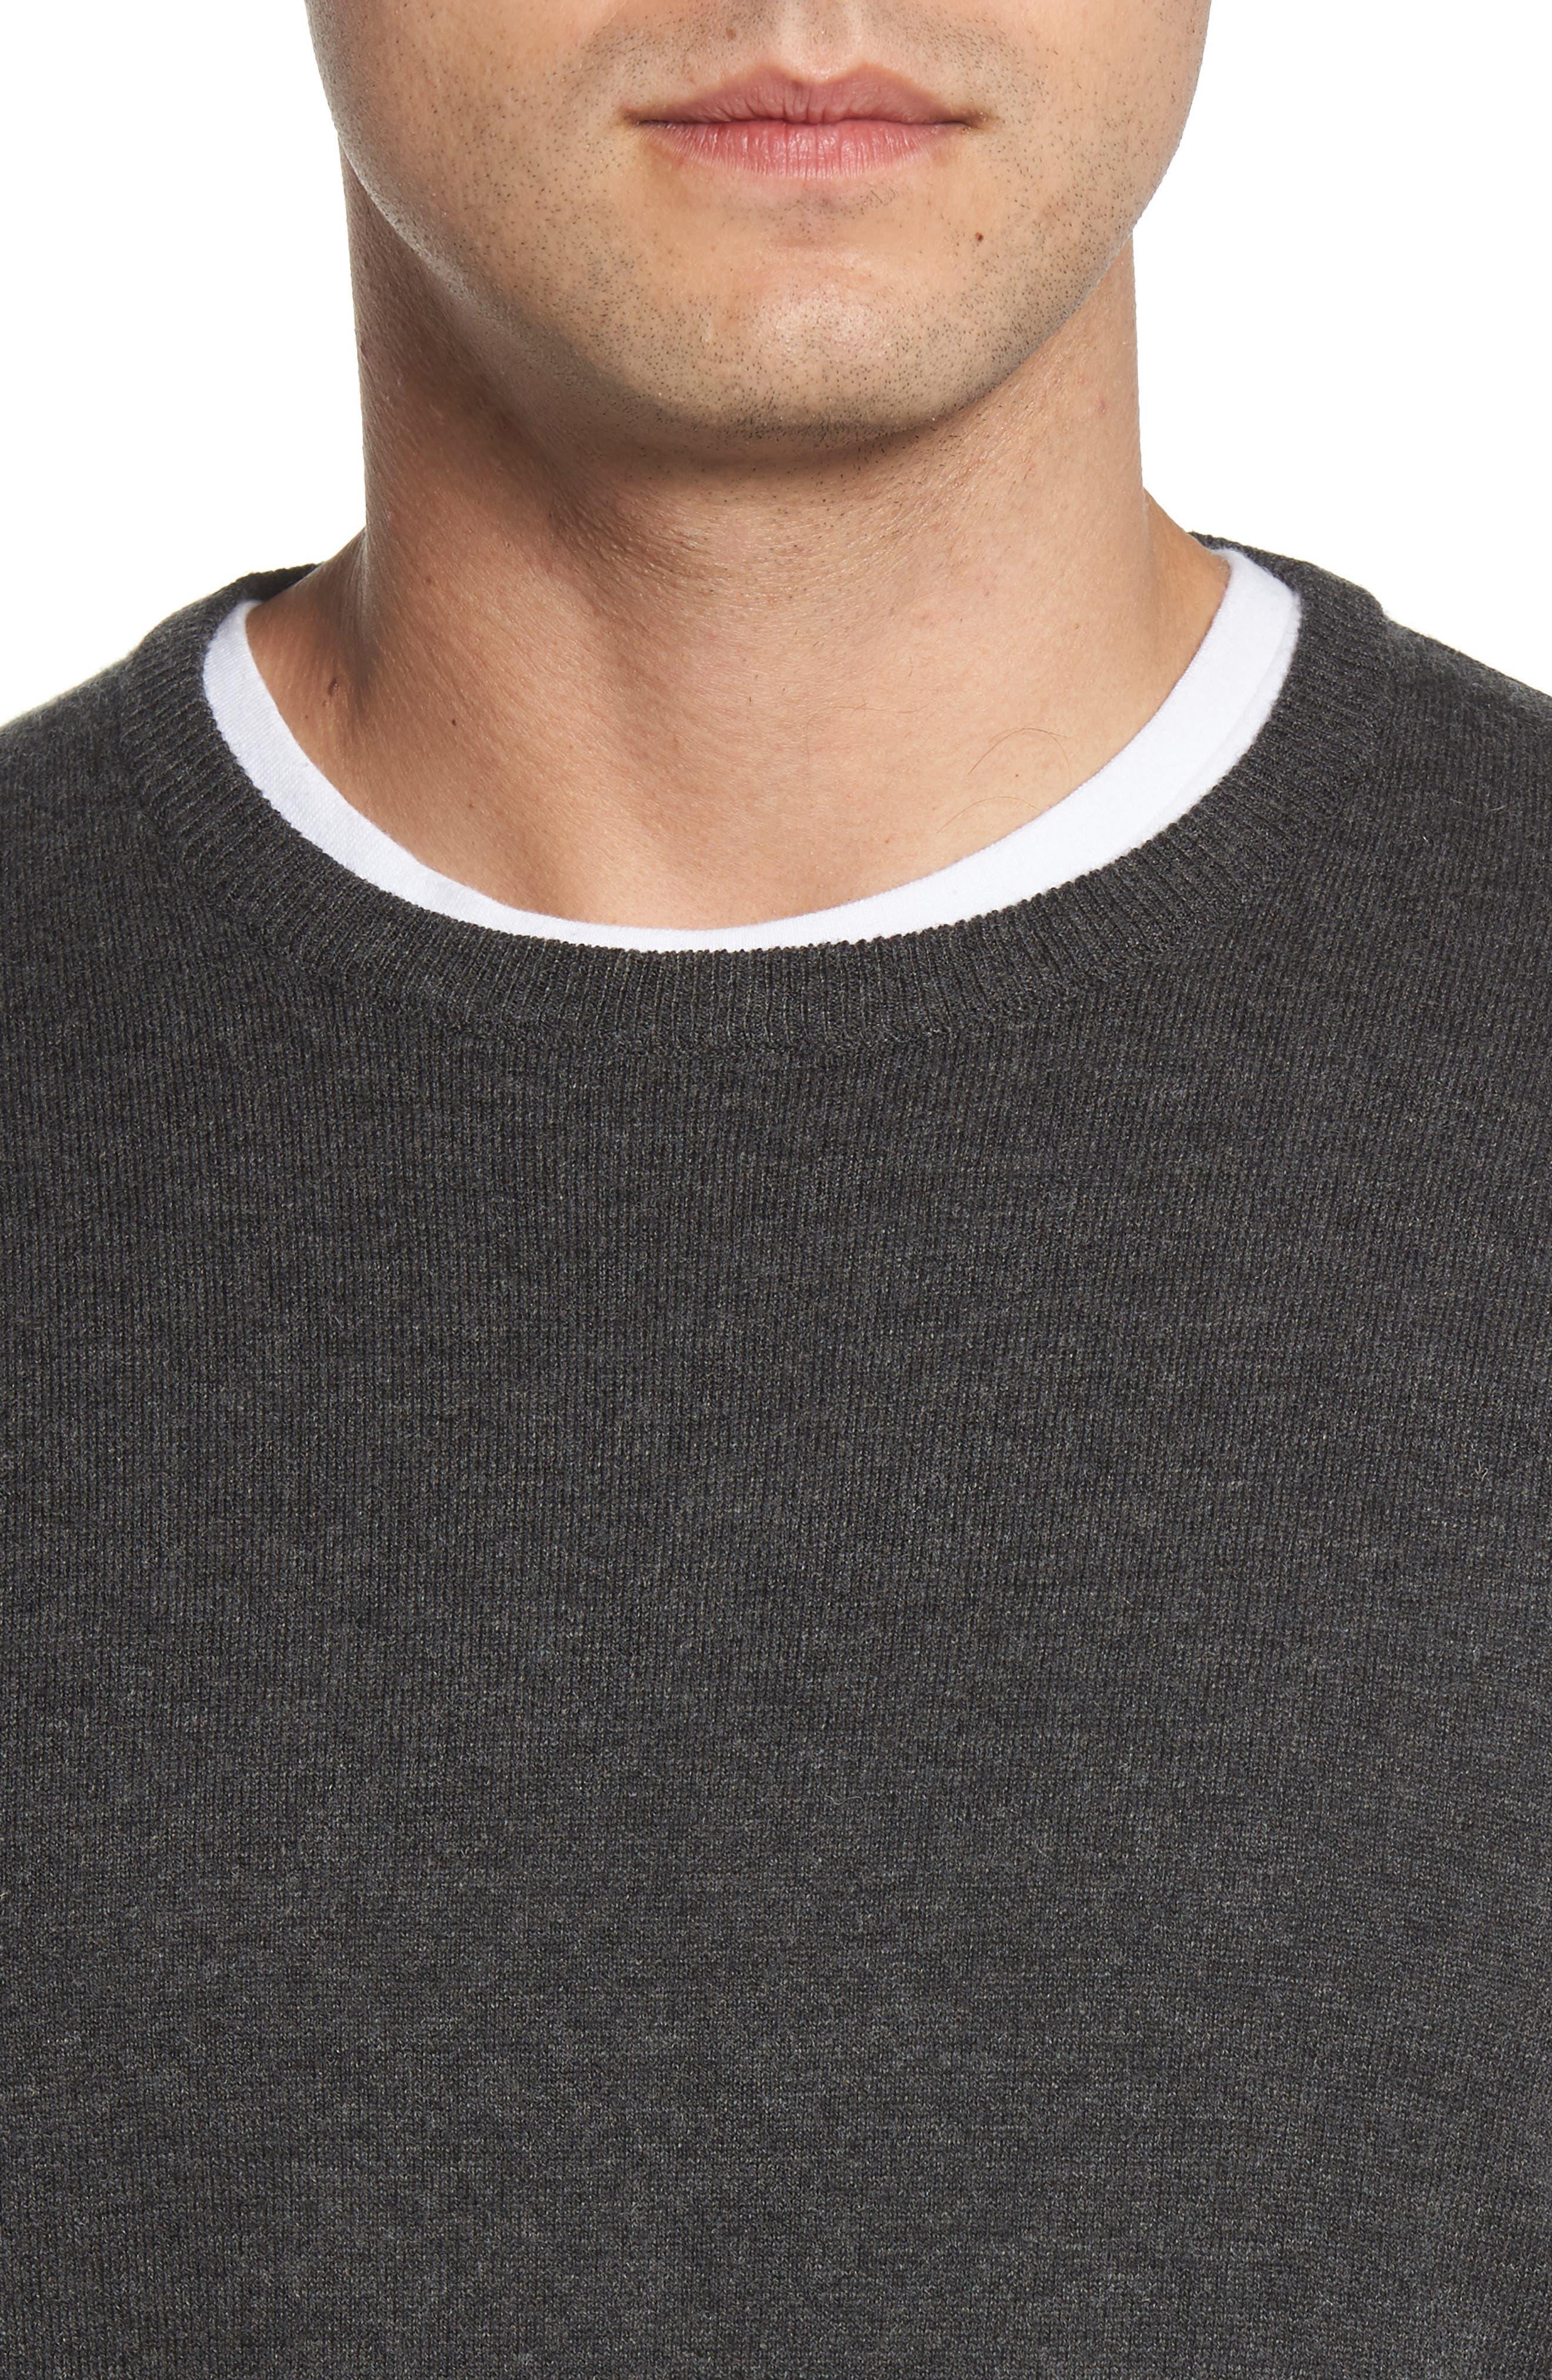 Wool & Cotton Crewneck Sweater,                             Alternate thumbnail 4, color,                             022